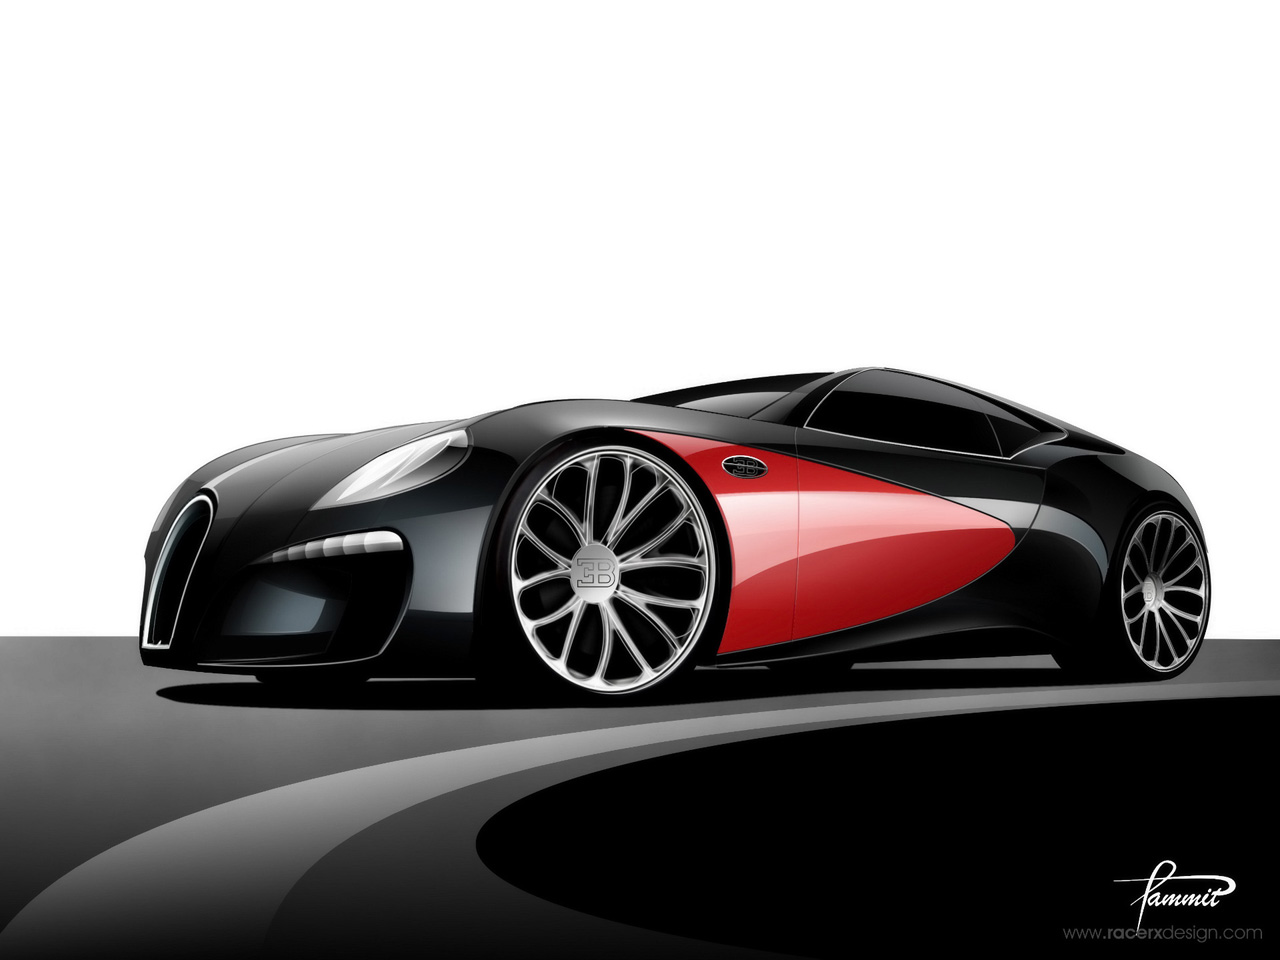 http://1.bp.blogspot.com/-6lZ7wCy5RAE/Ti1g29bW3aI/AAAAAAAAIno/GmRBCFFE31Y/s1600/Bugatti+Type+12-2+Streamliner+Car+Wallpapers+5.jpg